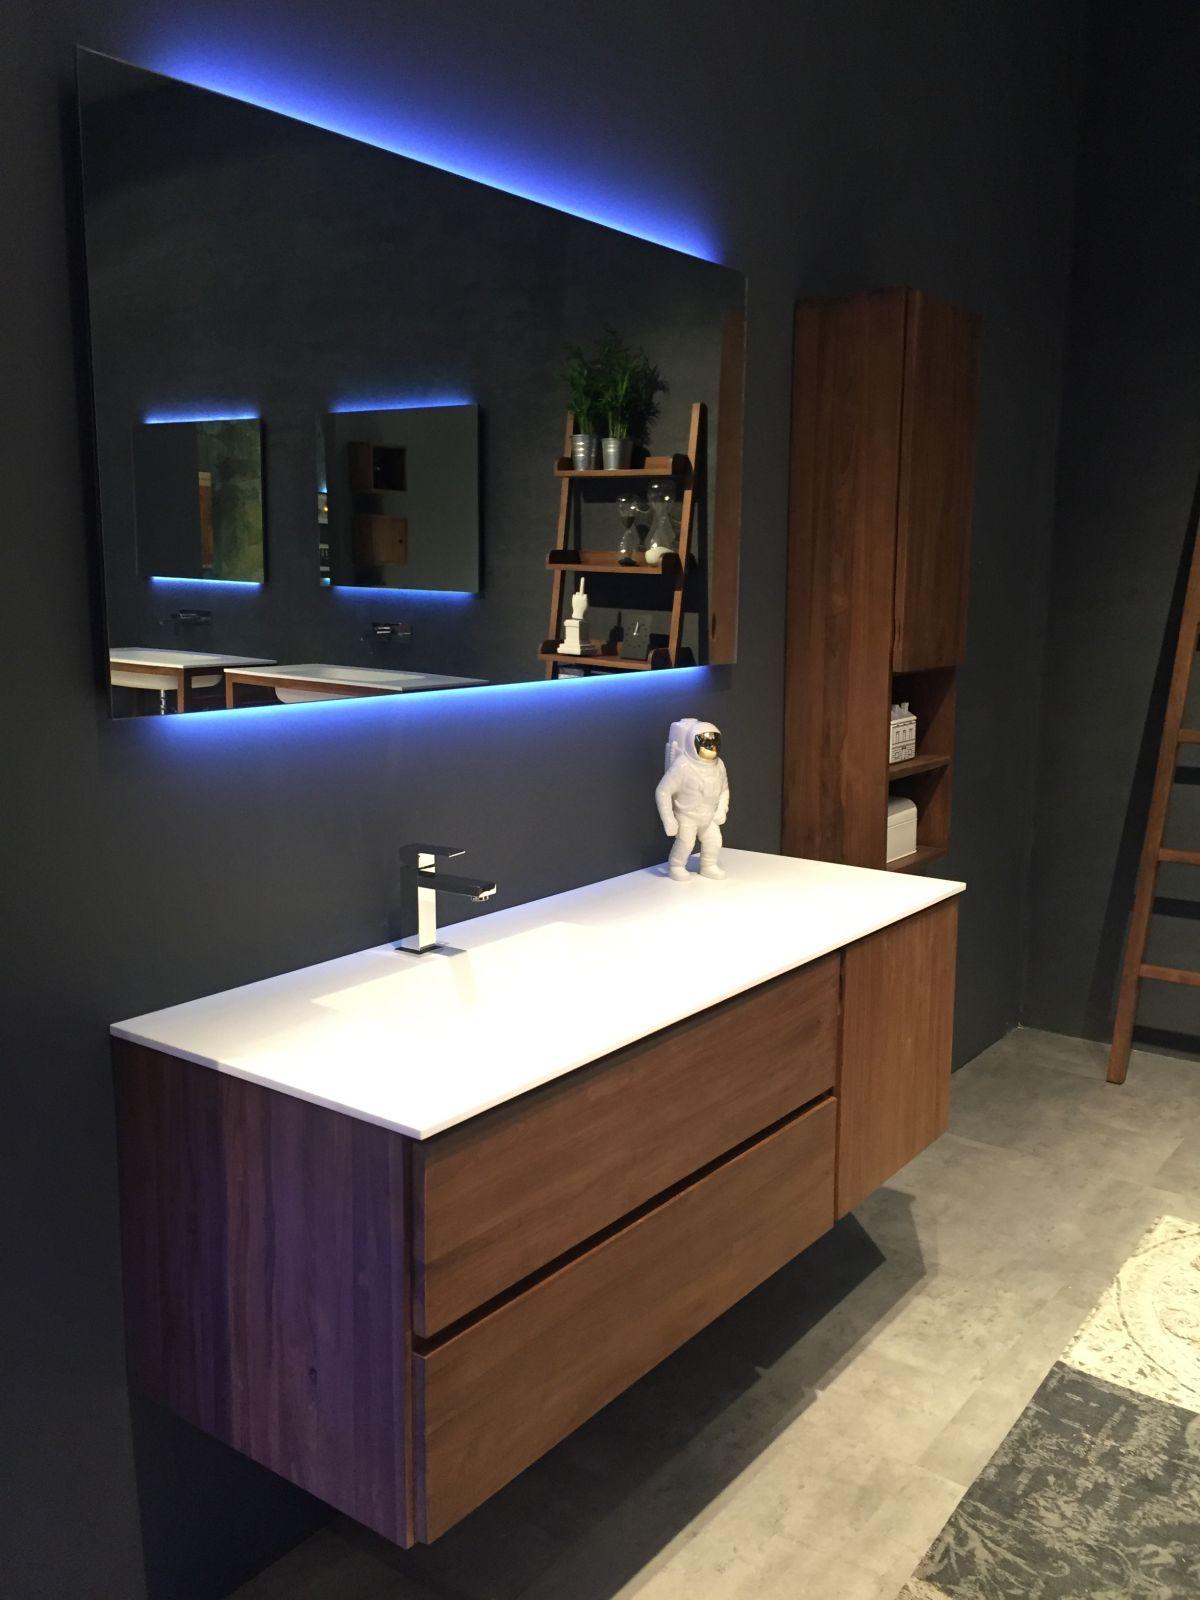 Stylish Ways To Decorate With Modern Bathroom Vanities ...